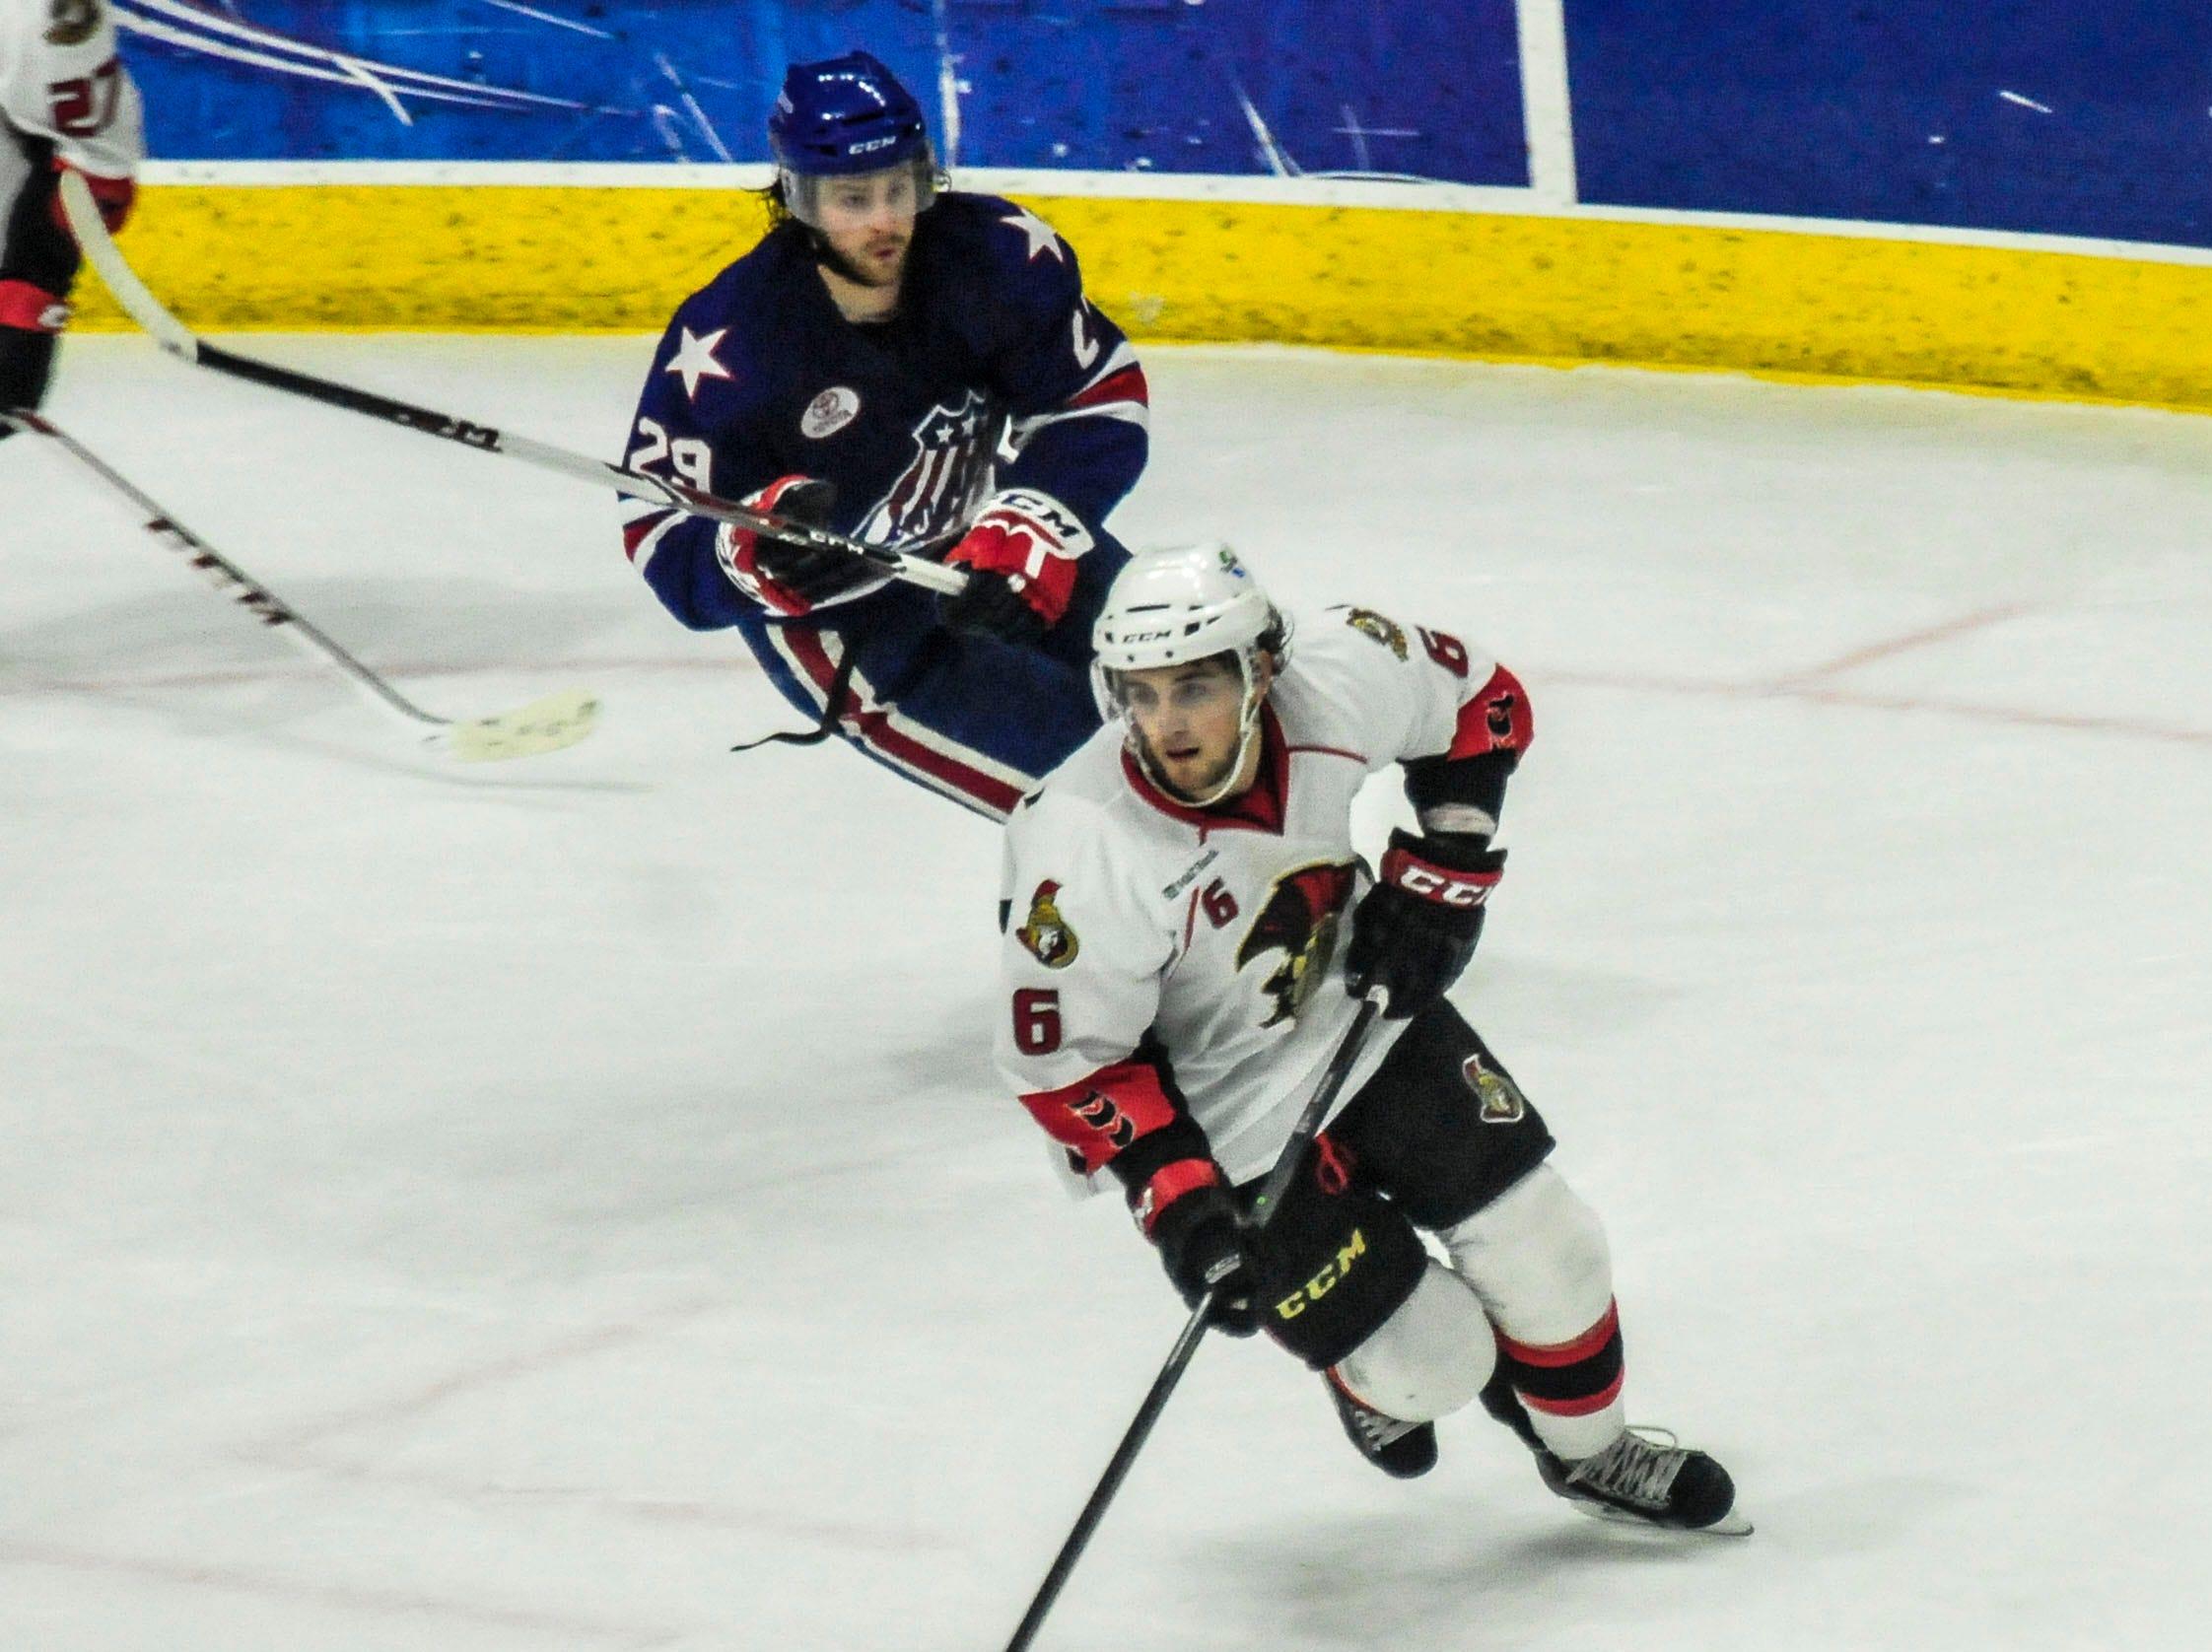 2014: BinghamtonÕs Chris Wideman skates past RochesterÕs Alex Hutchings during Saturday nightÕs hockey game at Broome County Veterans Memorial Arena.